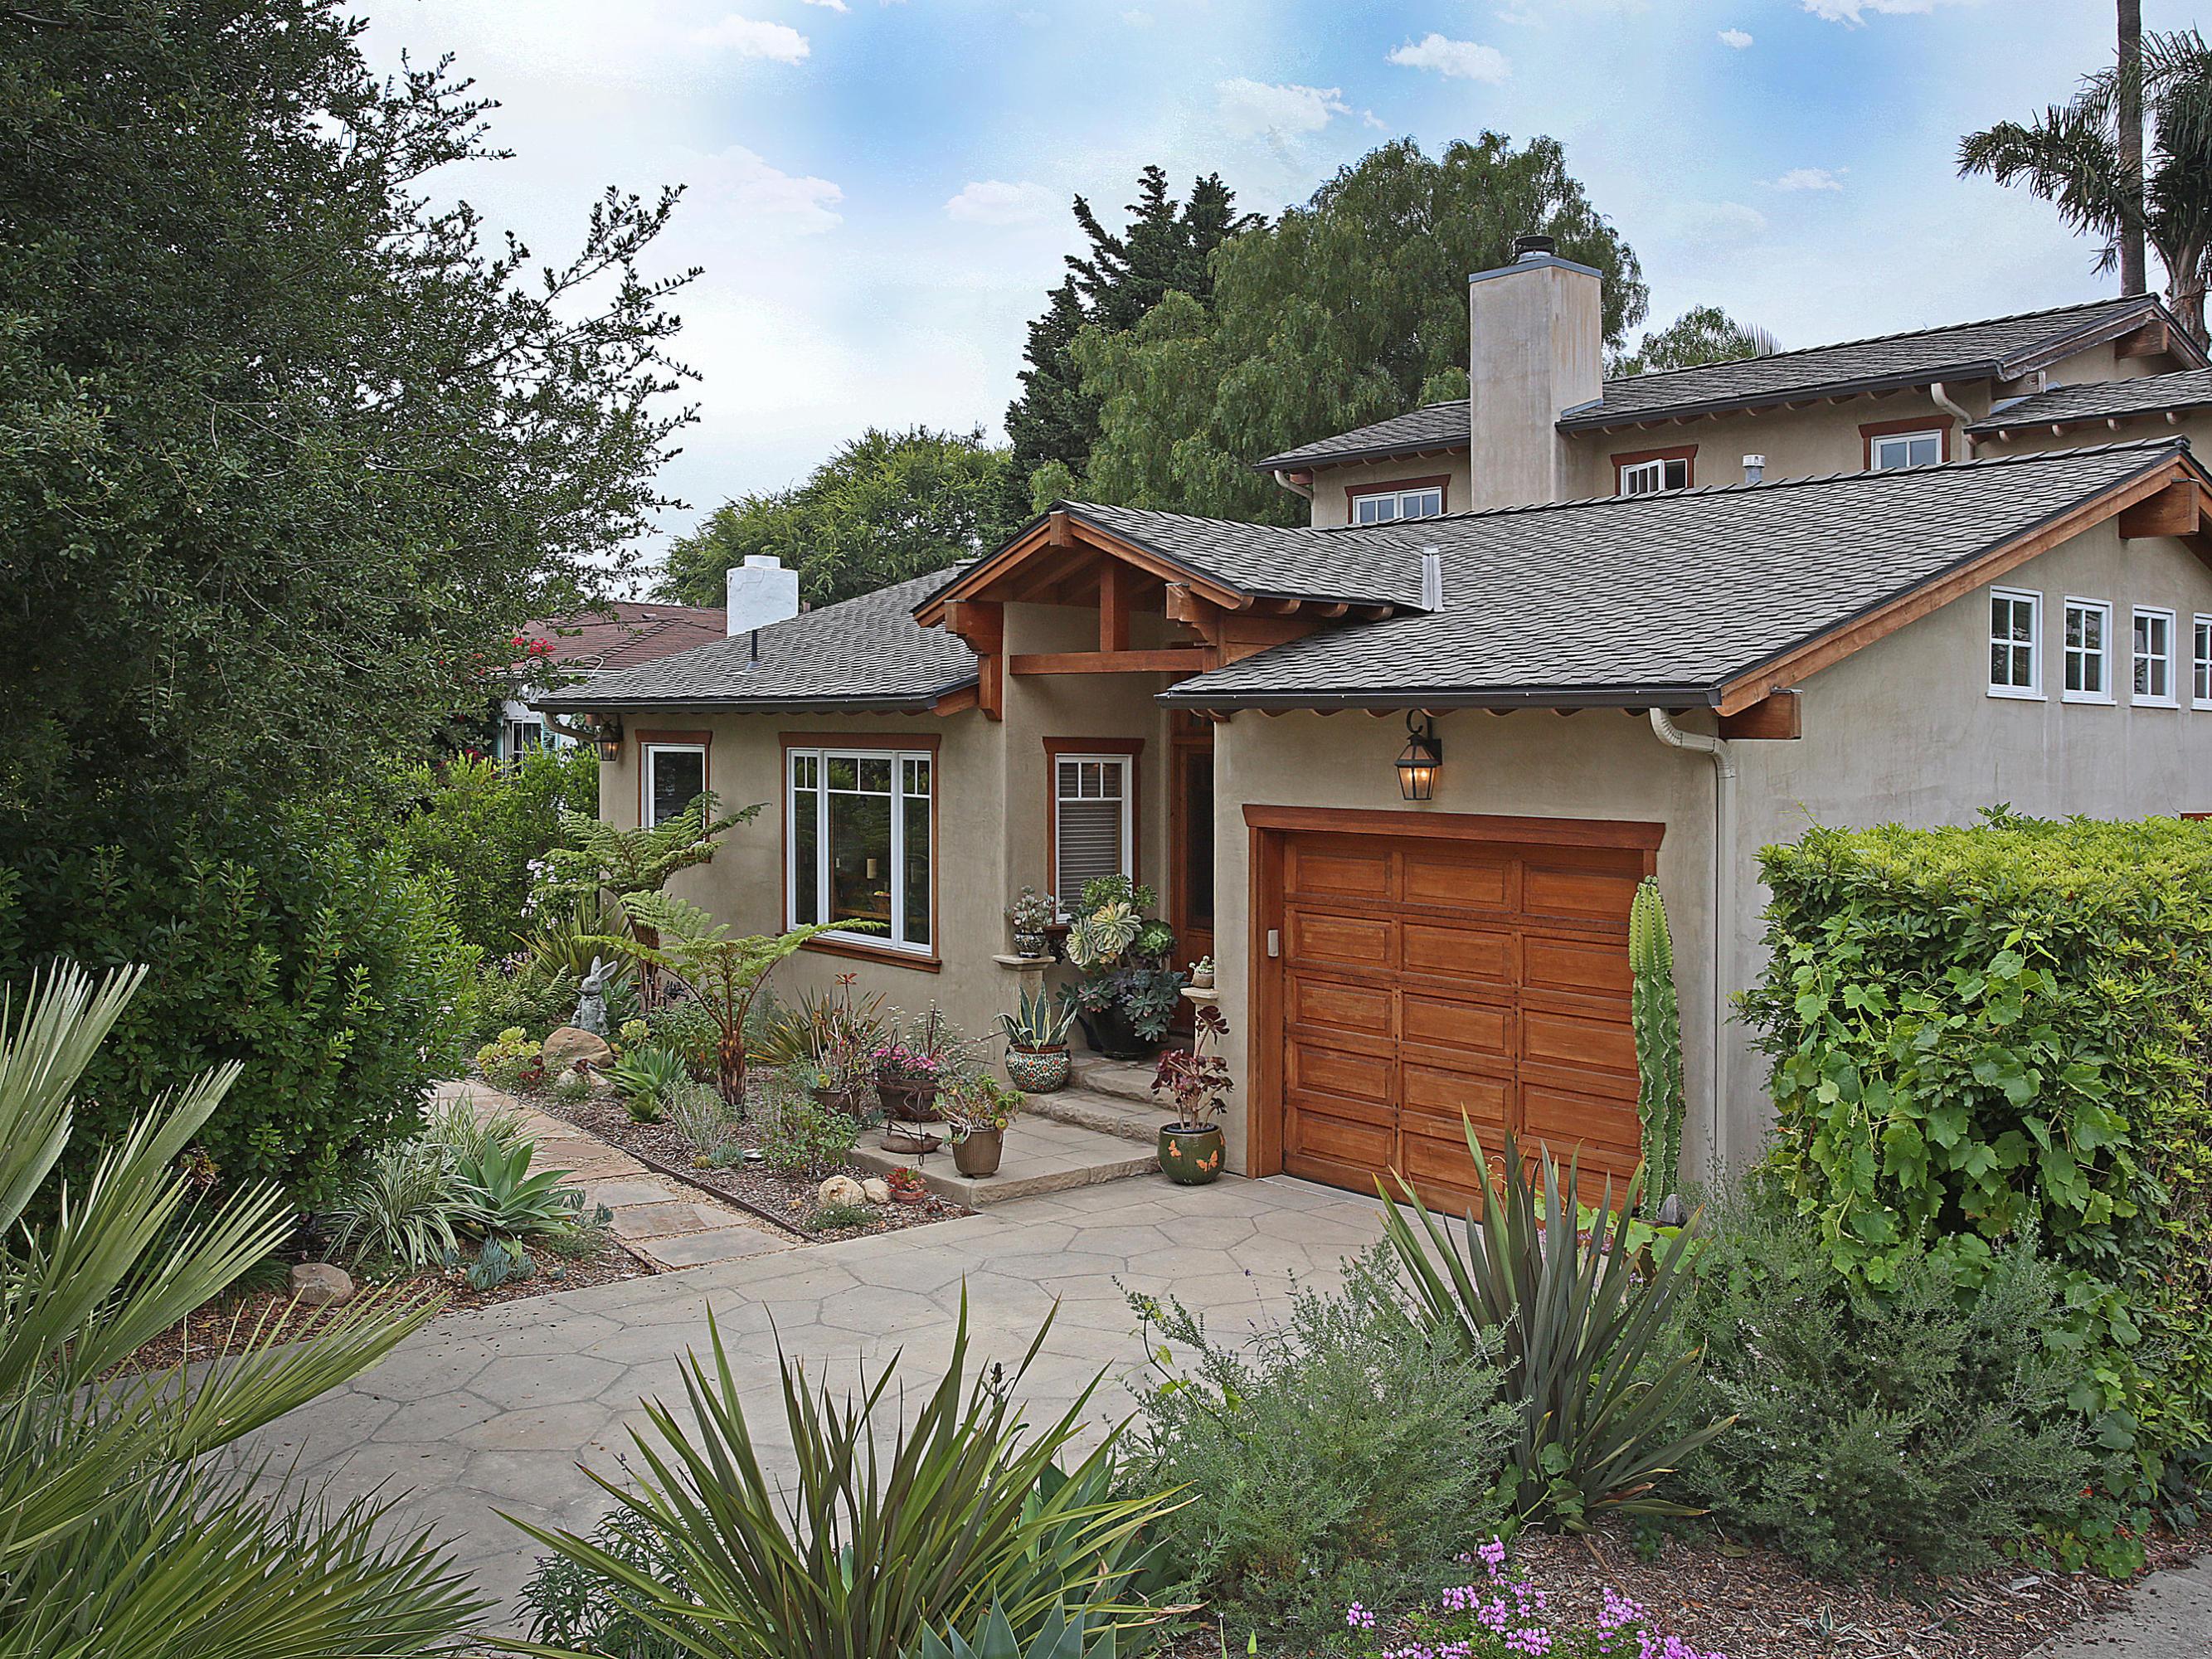 Property photo for 2908 Ventura Dr Santa Barbara, California 93105 - 14-2095